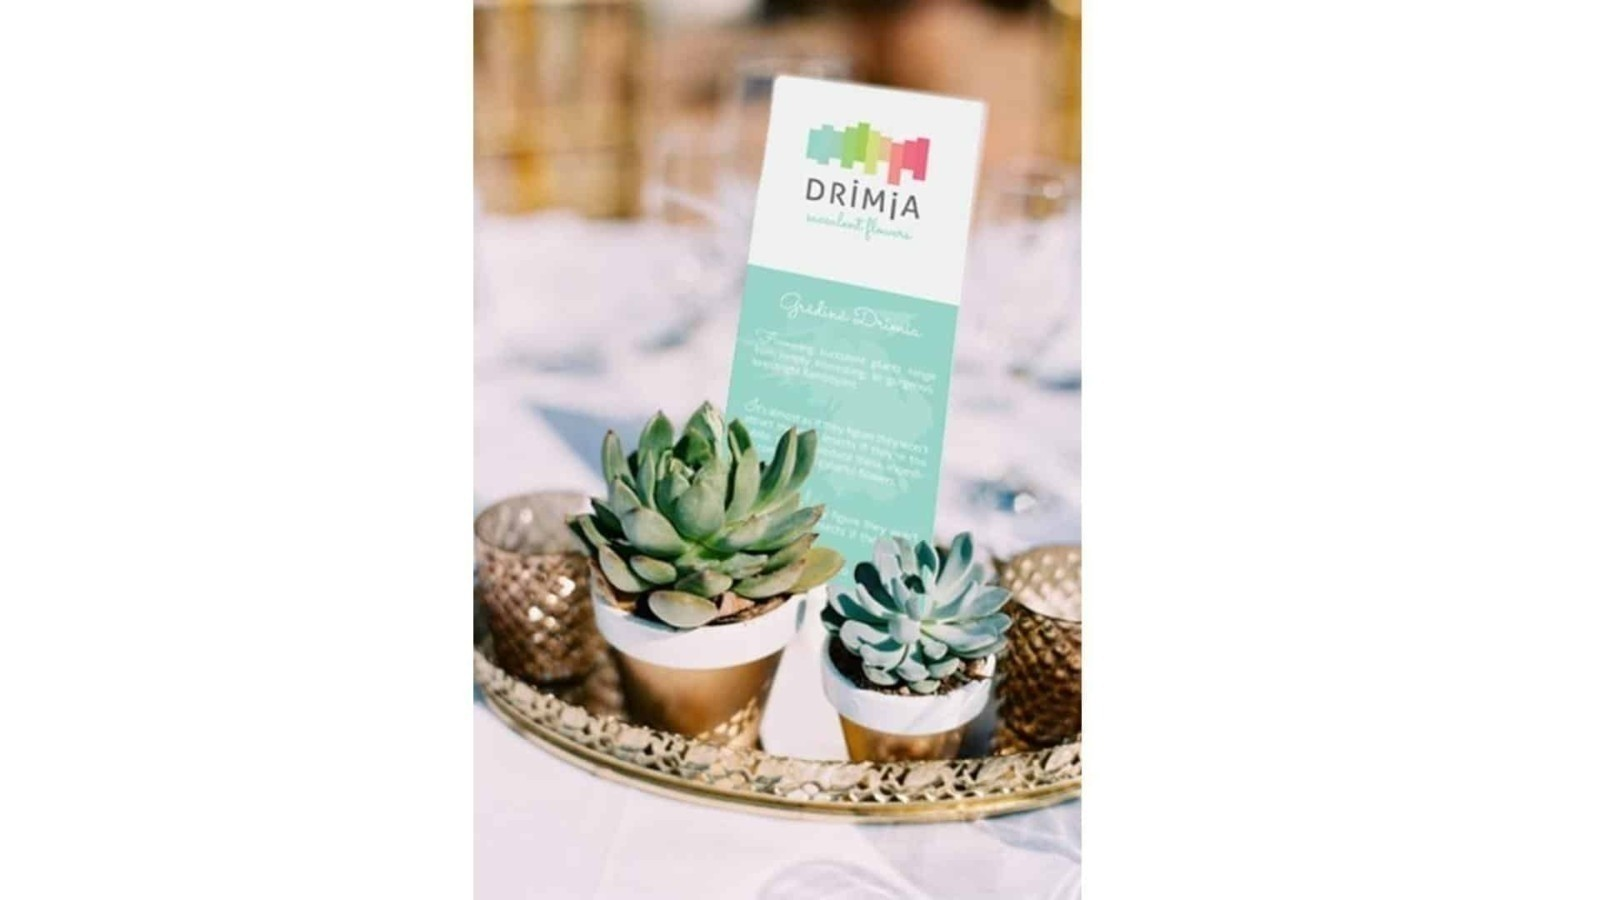 Drimia, branding